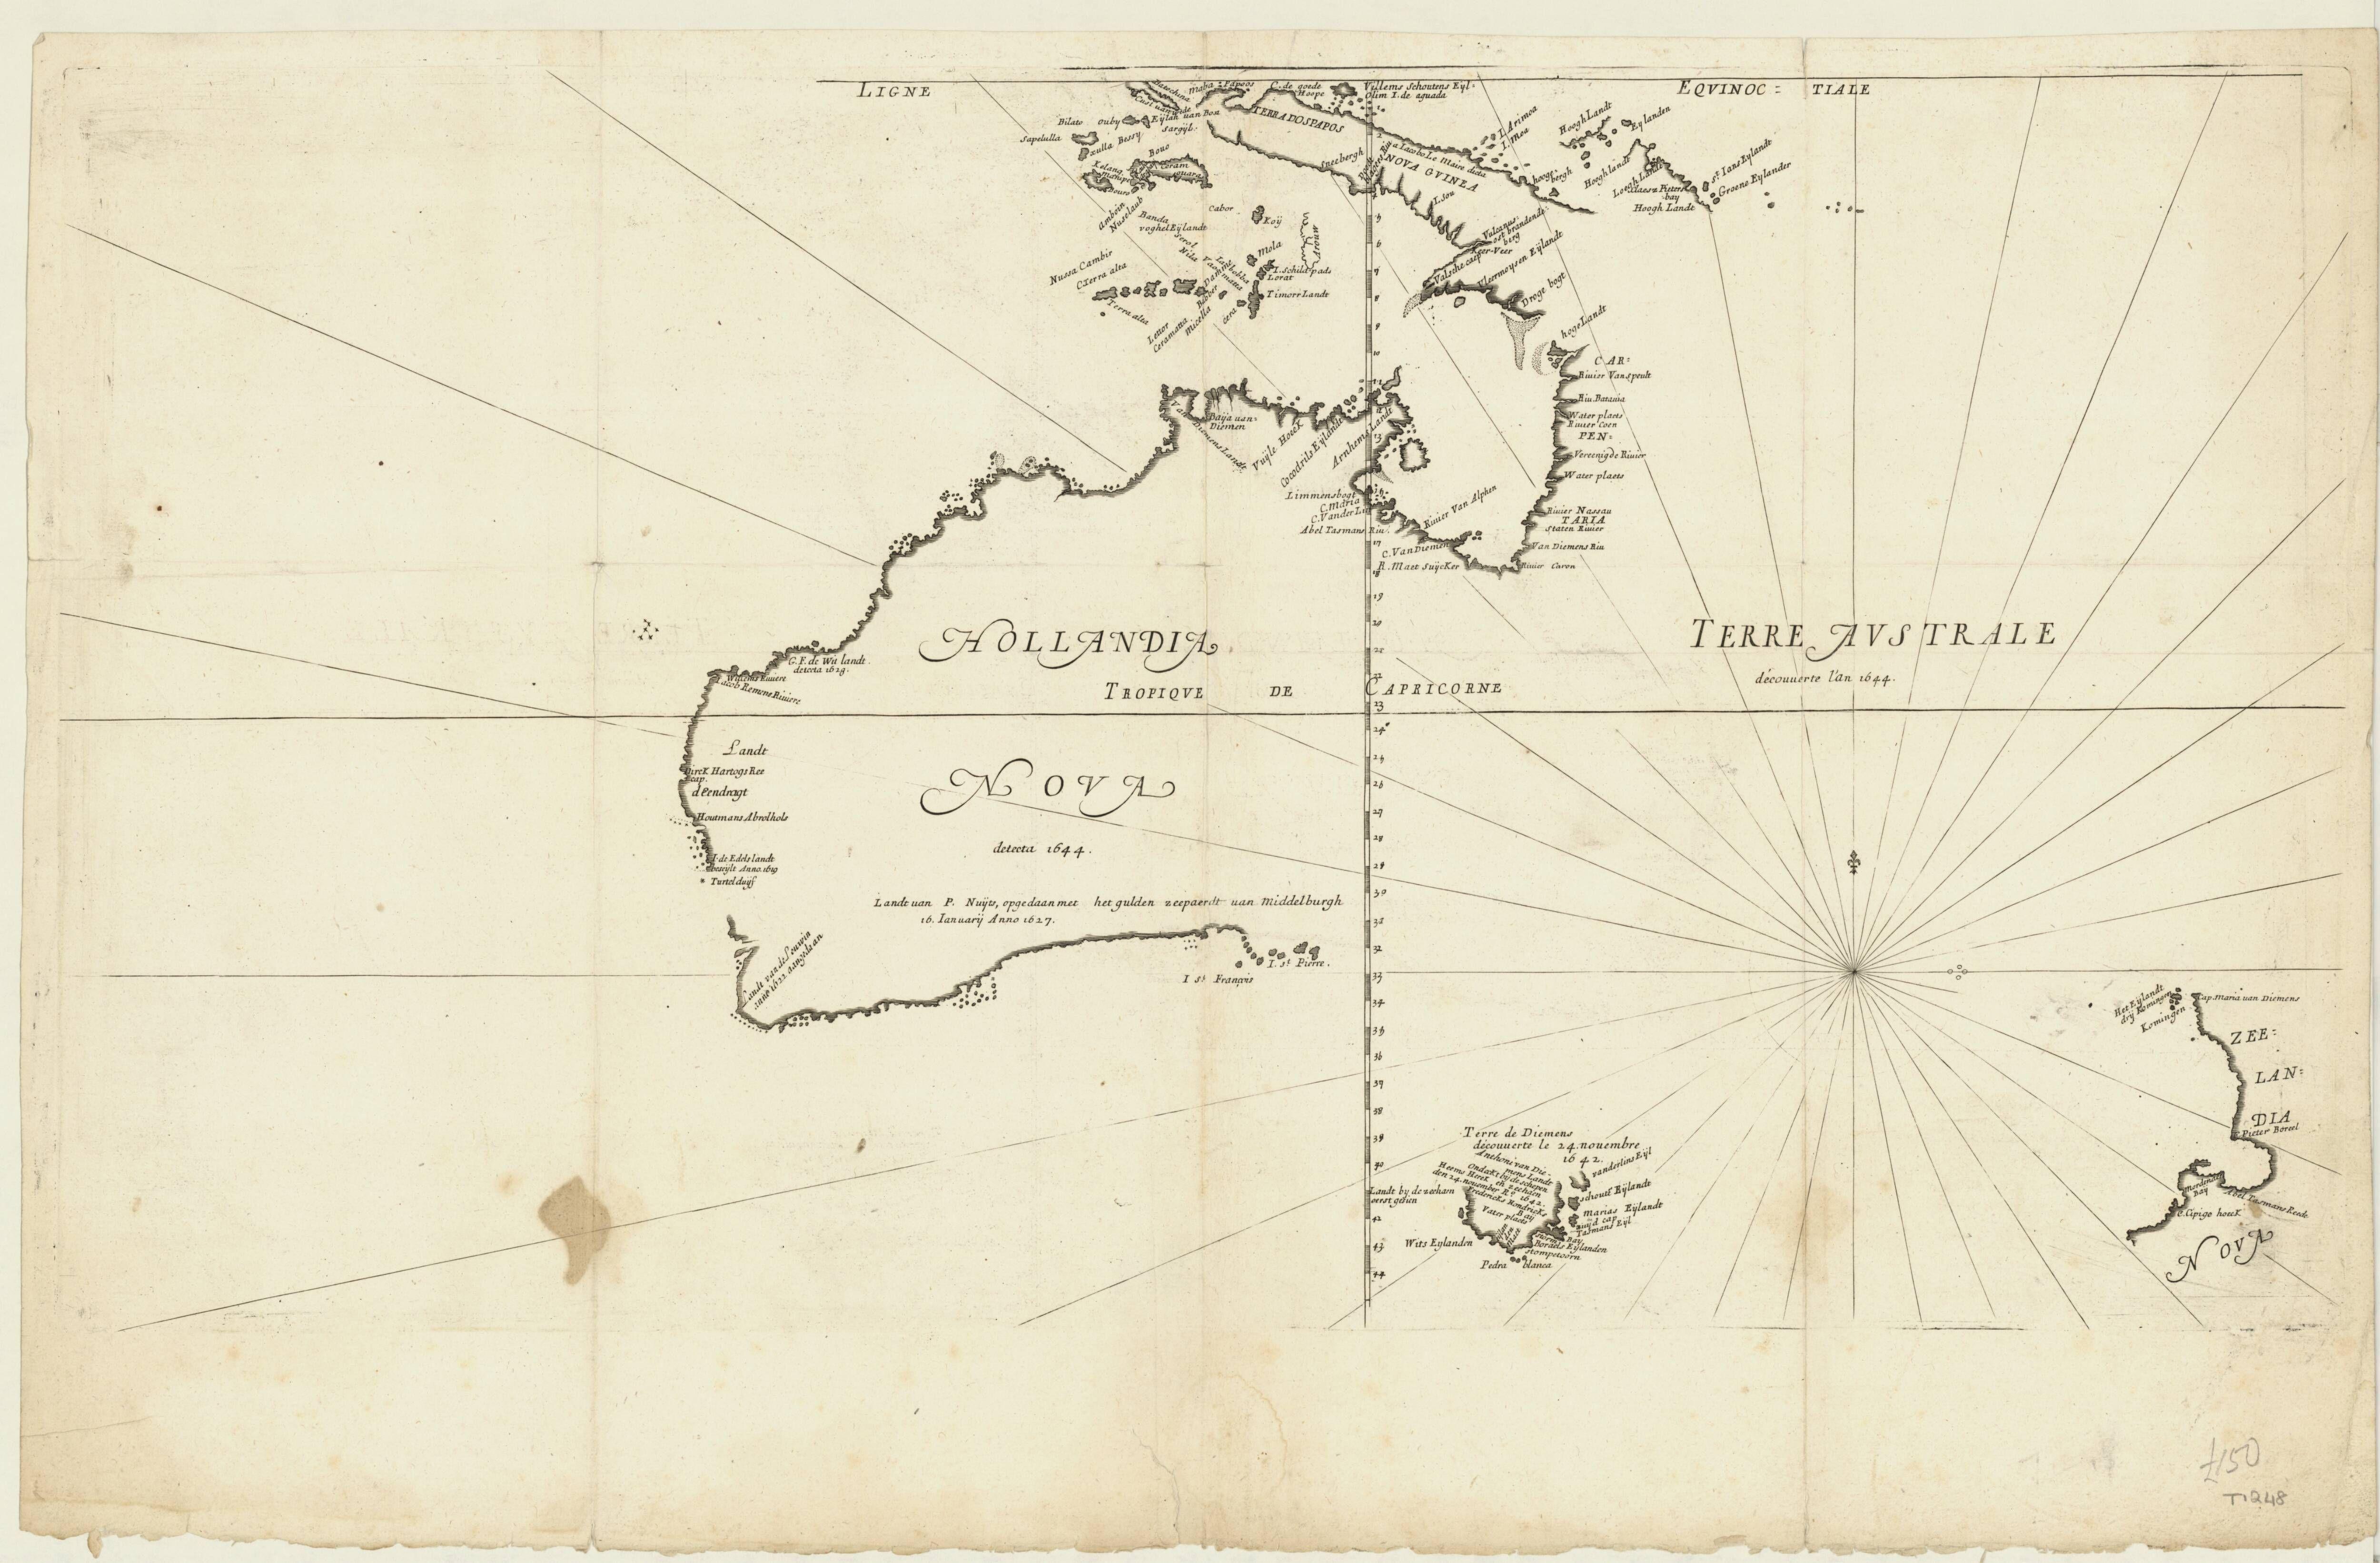 hollandia nova detecta 1644 map of australia incomplete south and east coast part